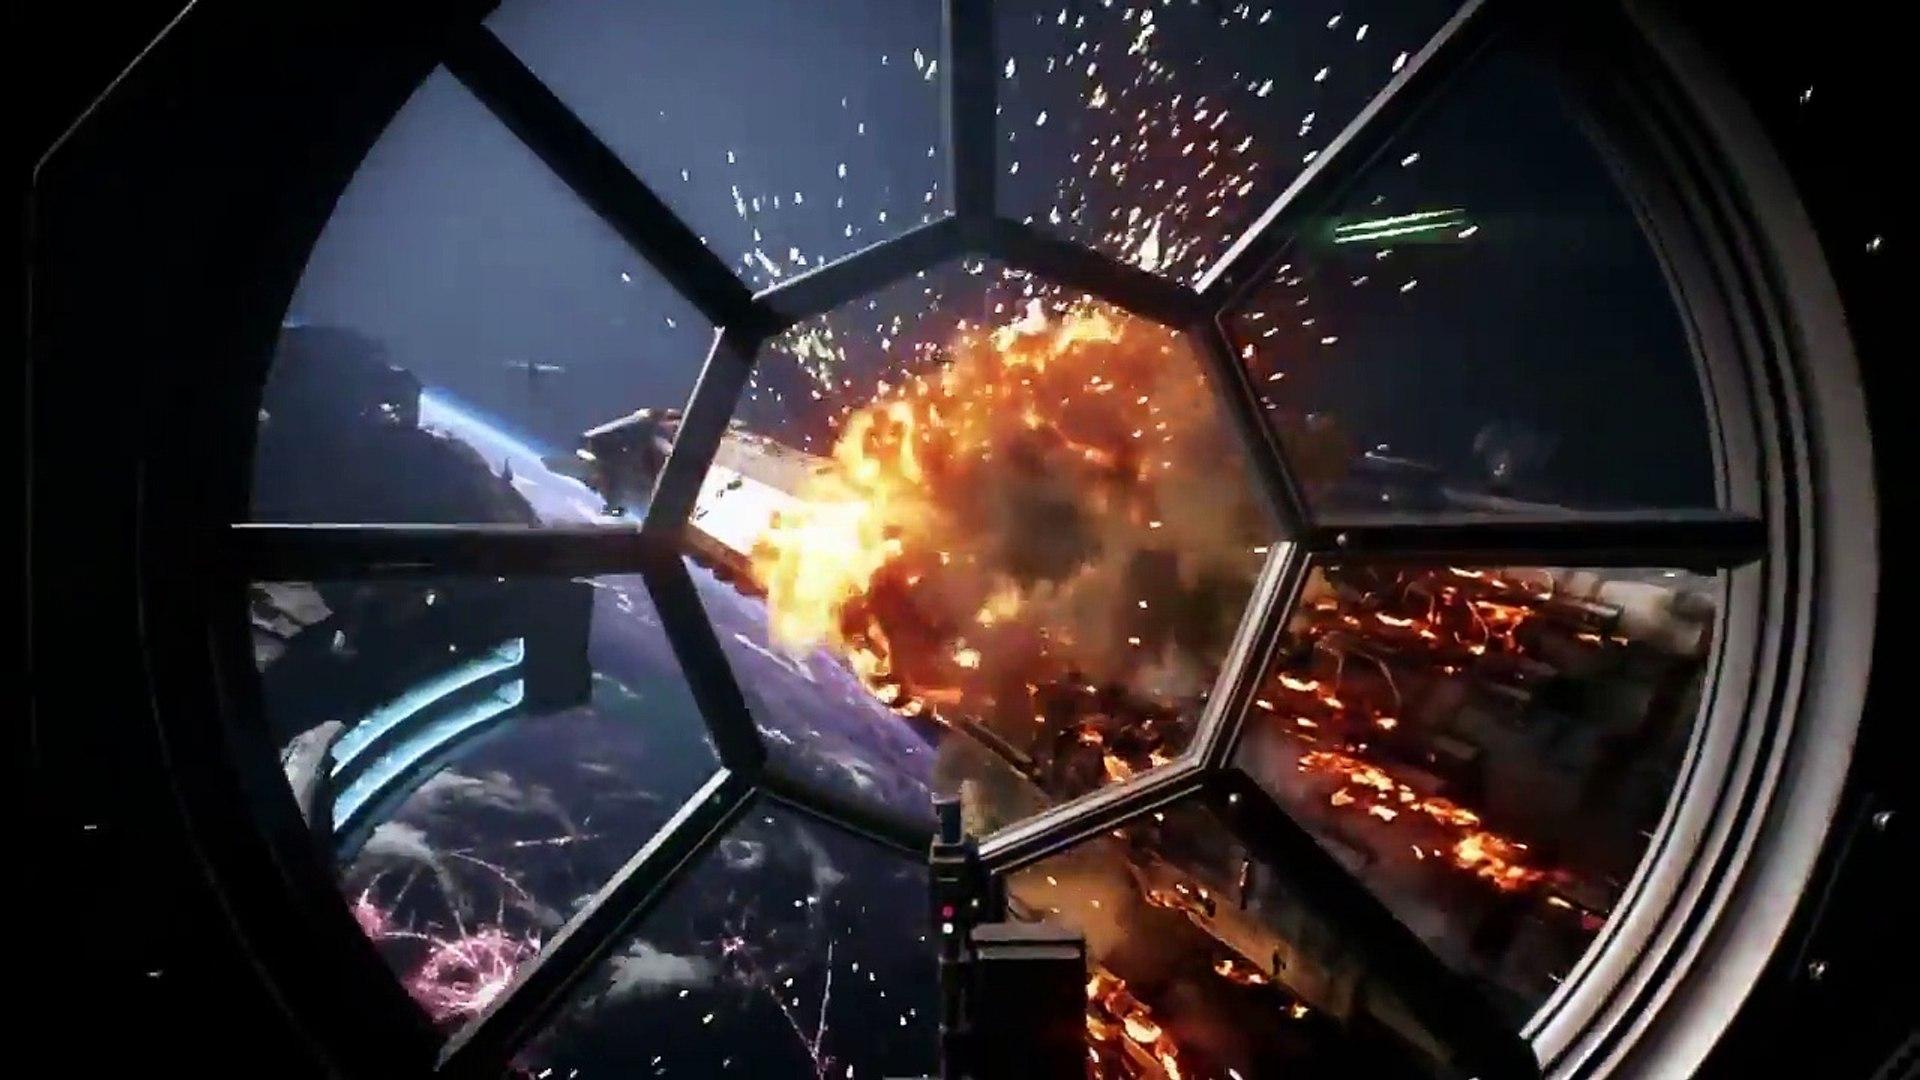 Star Wars Battlefront 2 This Is Star Wars Battlefront 2 Trailer